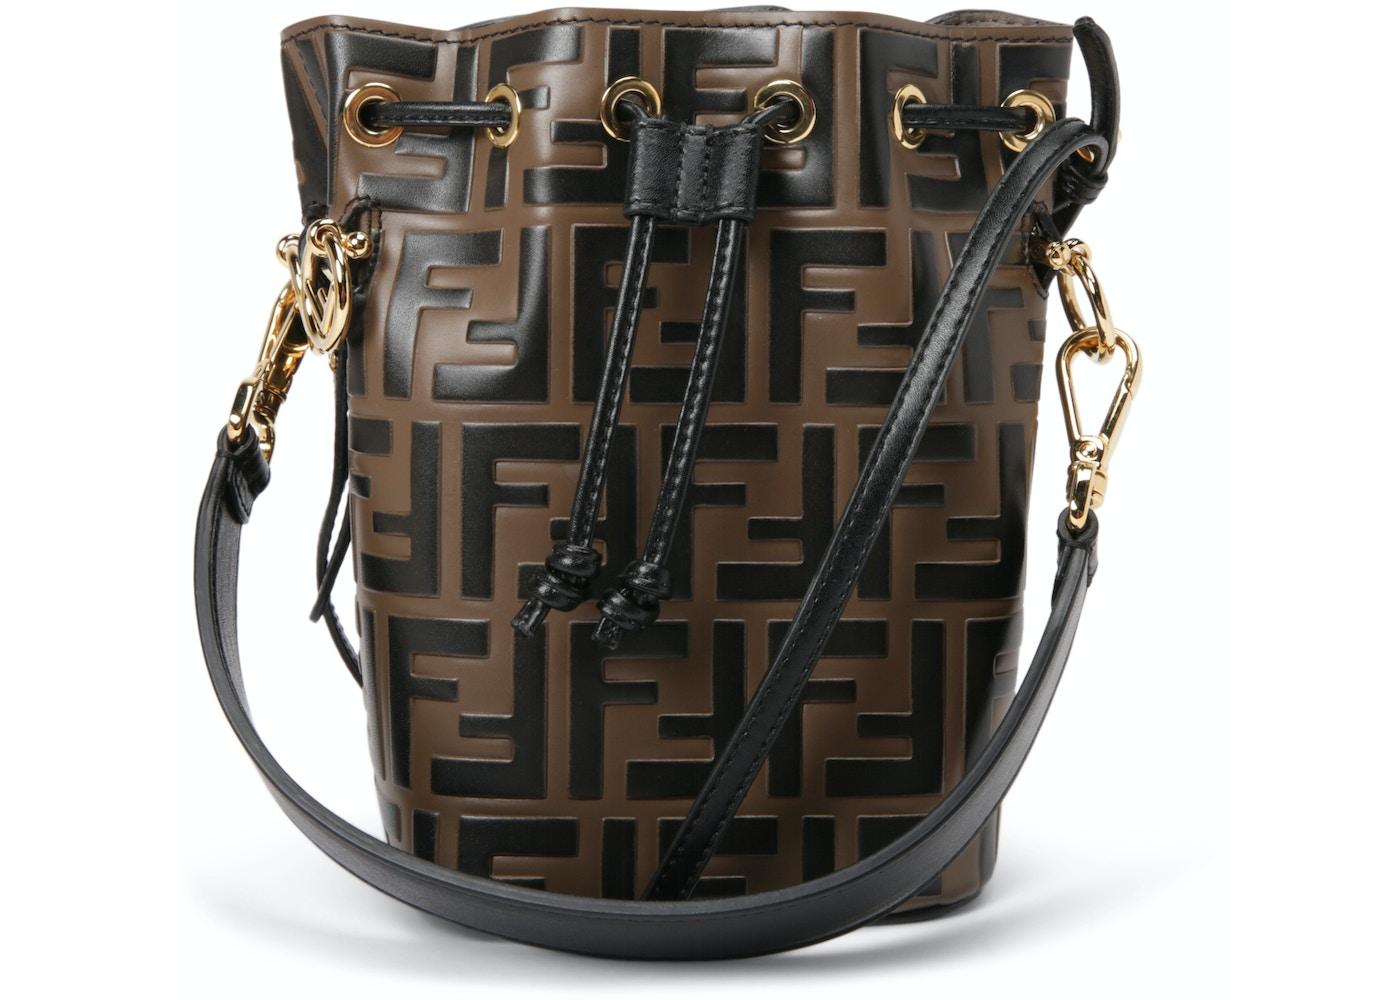 03752d42d3 Buy   Sell Fendi Handbags - Total Sold